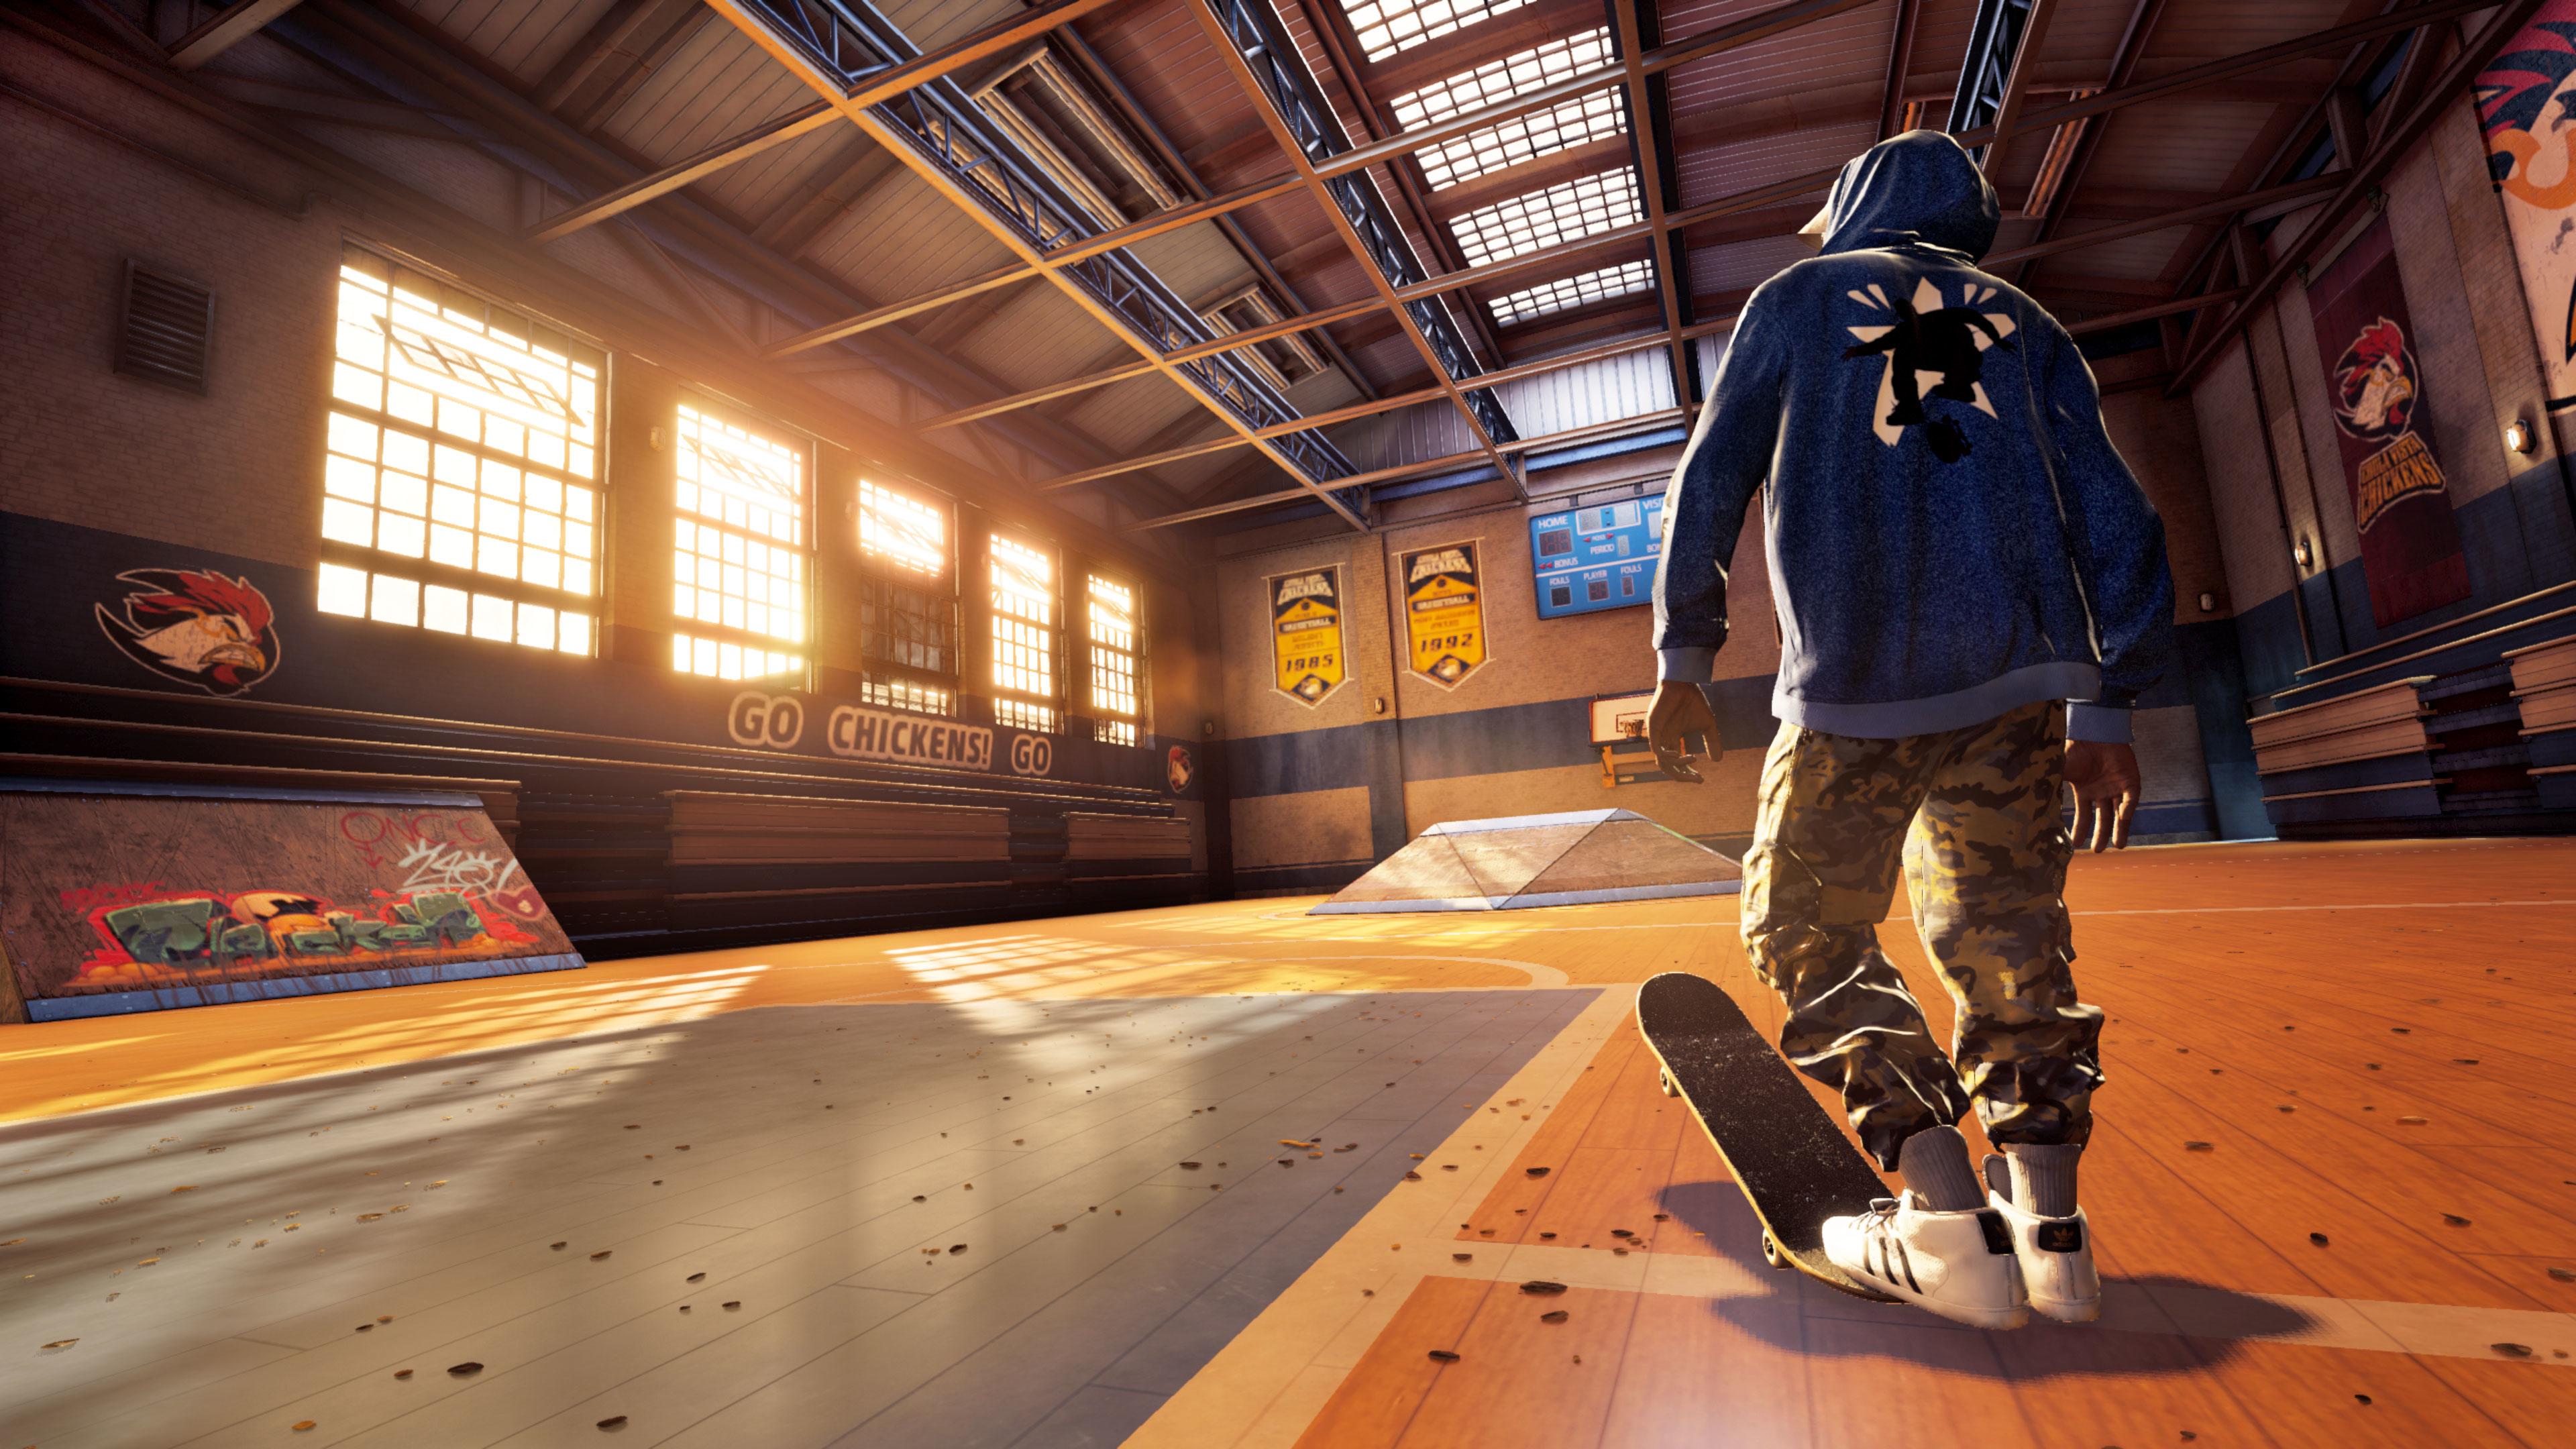 2560x1440 Tony Hawk's Pro Skater 1 Remaster 1440P ...